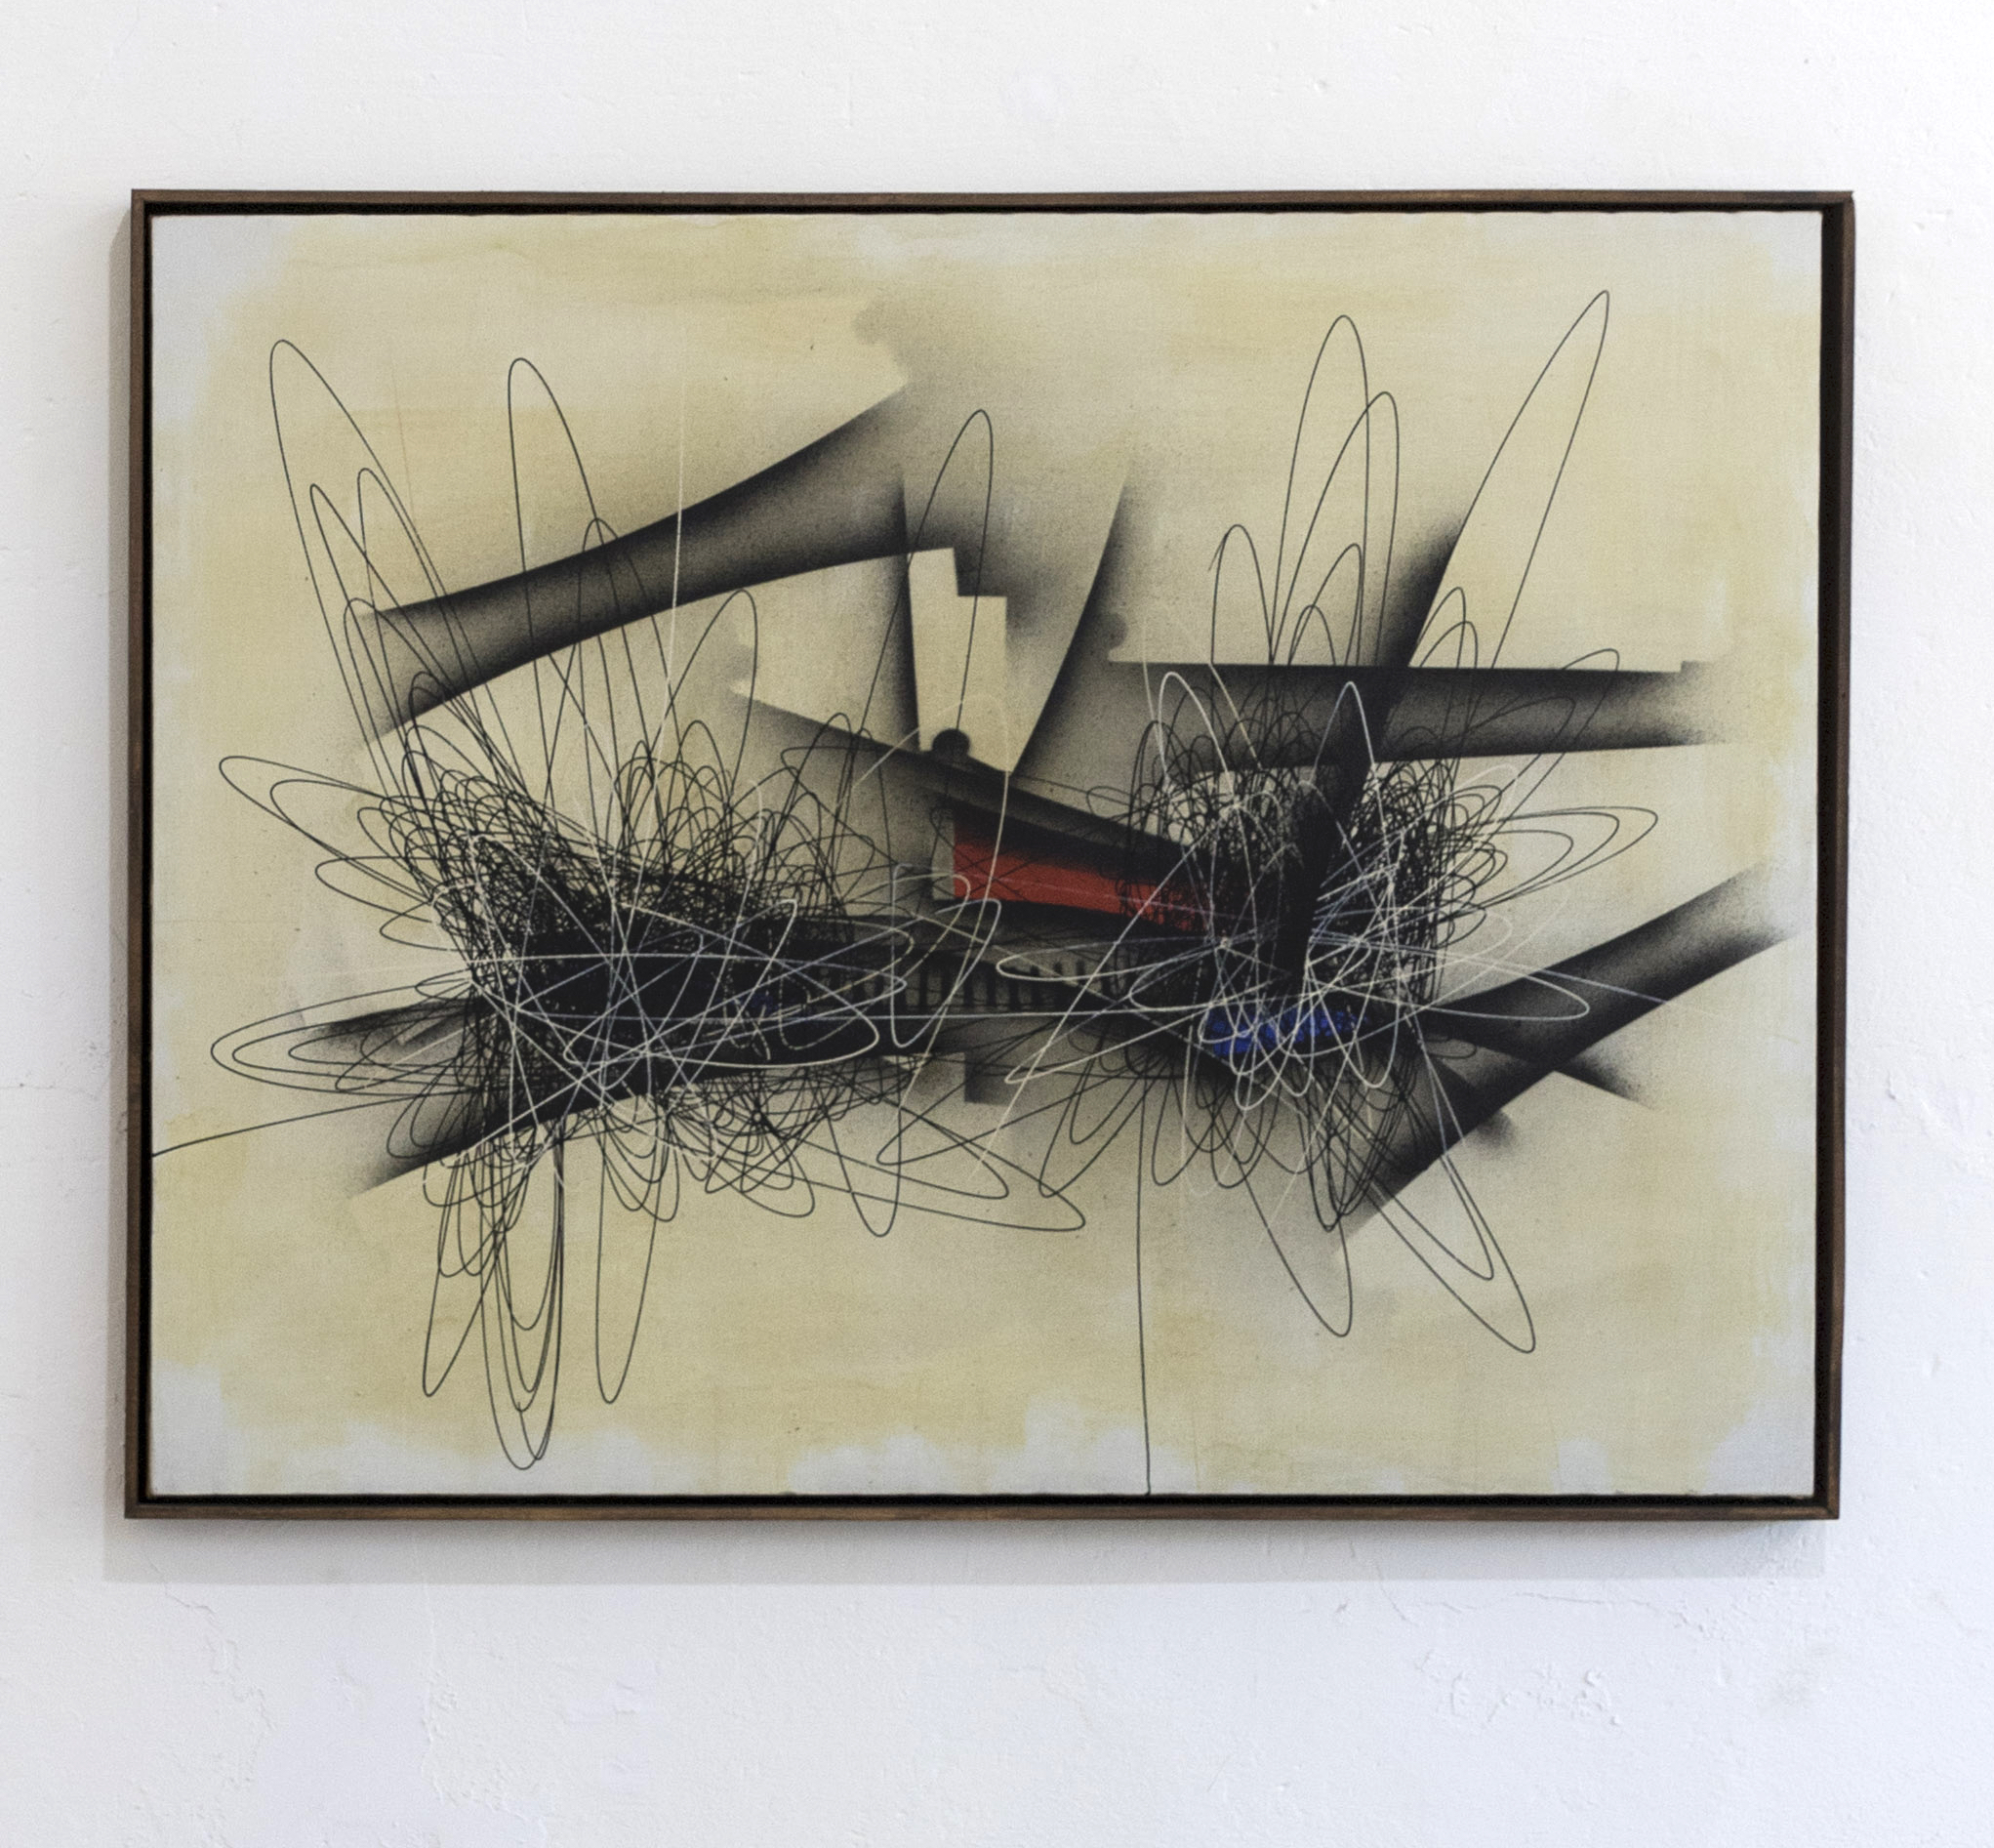 Roberto Crippa, Spirale, 1952, olio su tela, cm 100x130